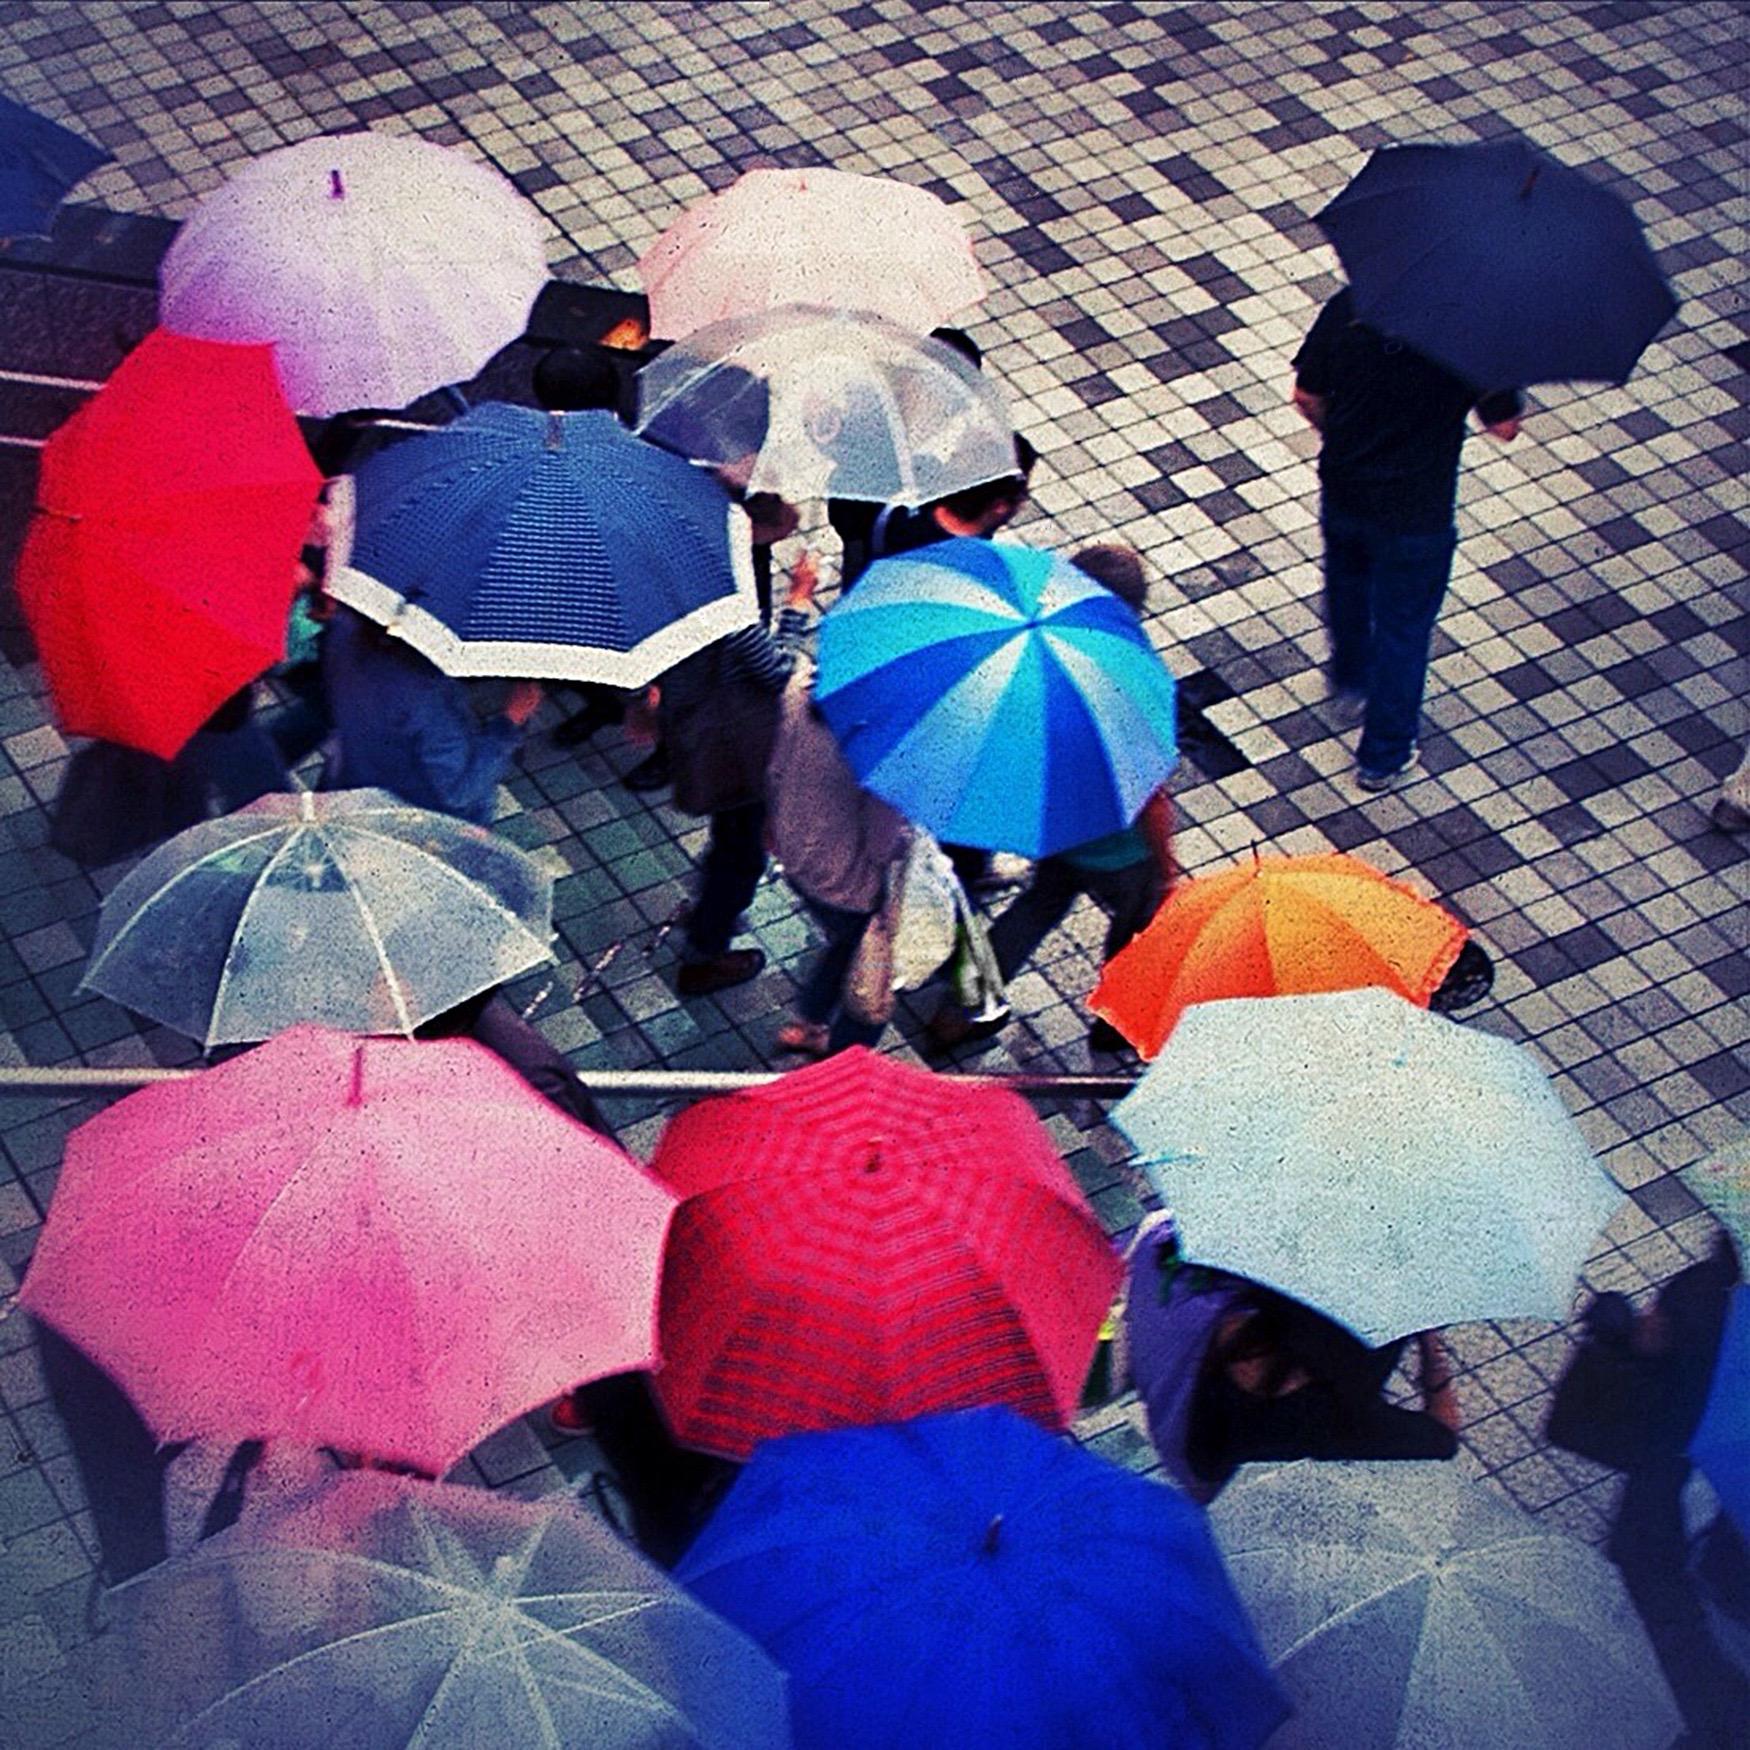 Umbrellasret.jpg